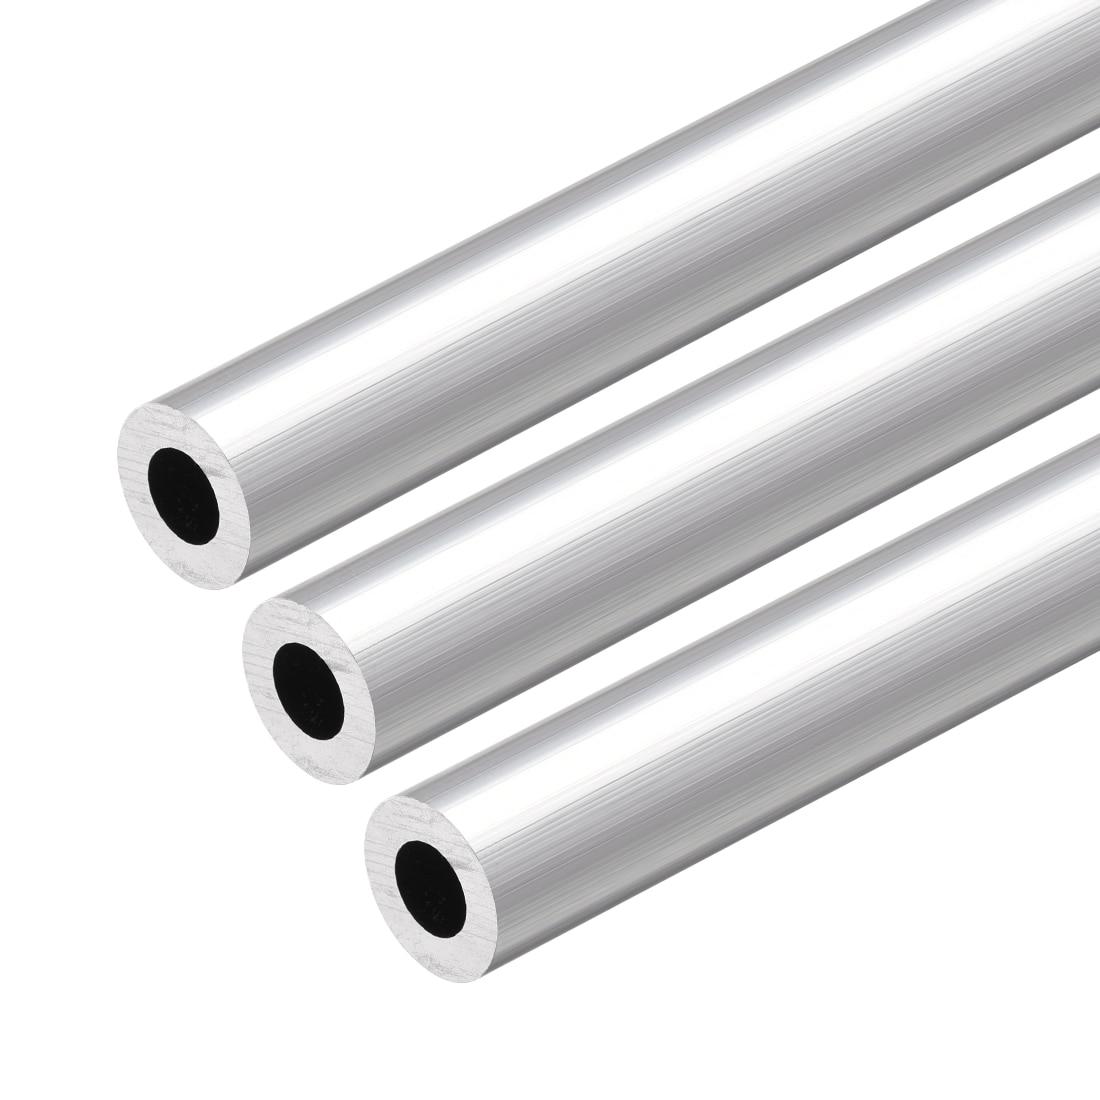 Uxcell 6063 Aluminum Round Tube 300mm Length 13mm OD 7mm Inner Dia Seamless Aluminum Straight Tubing 3 Pcs